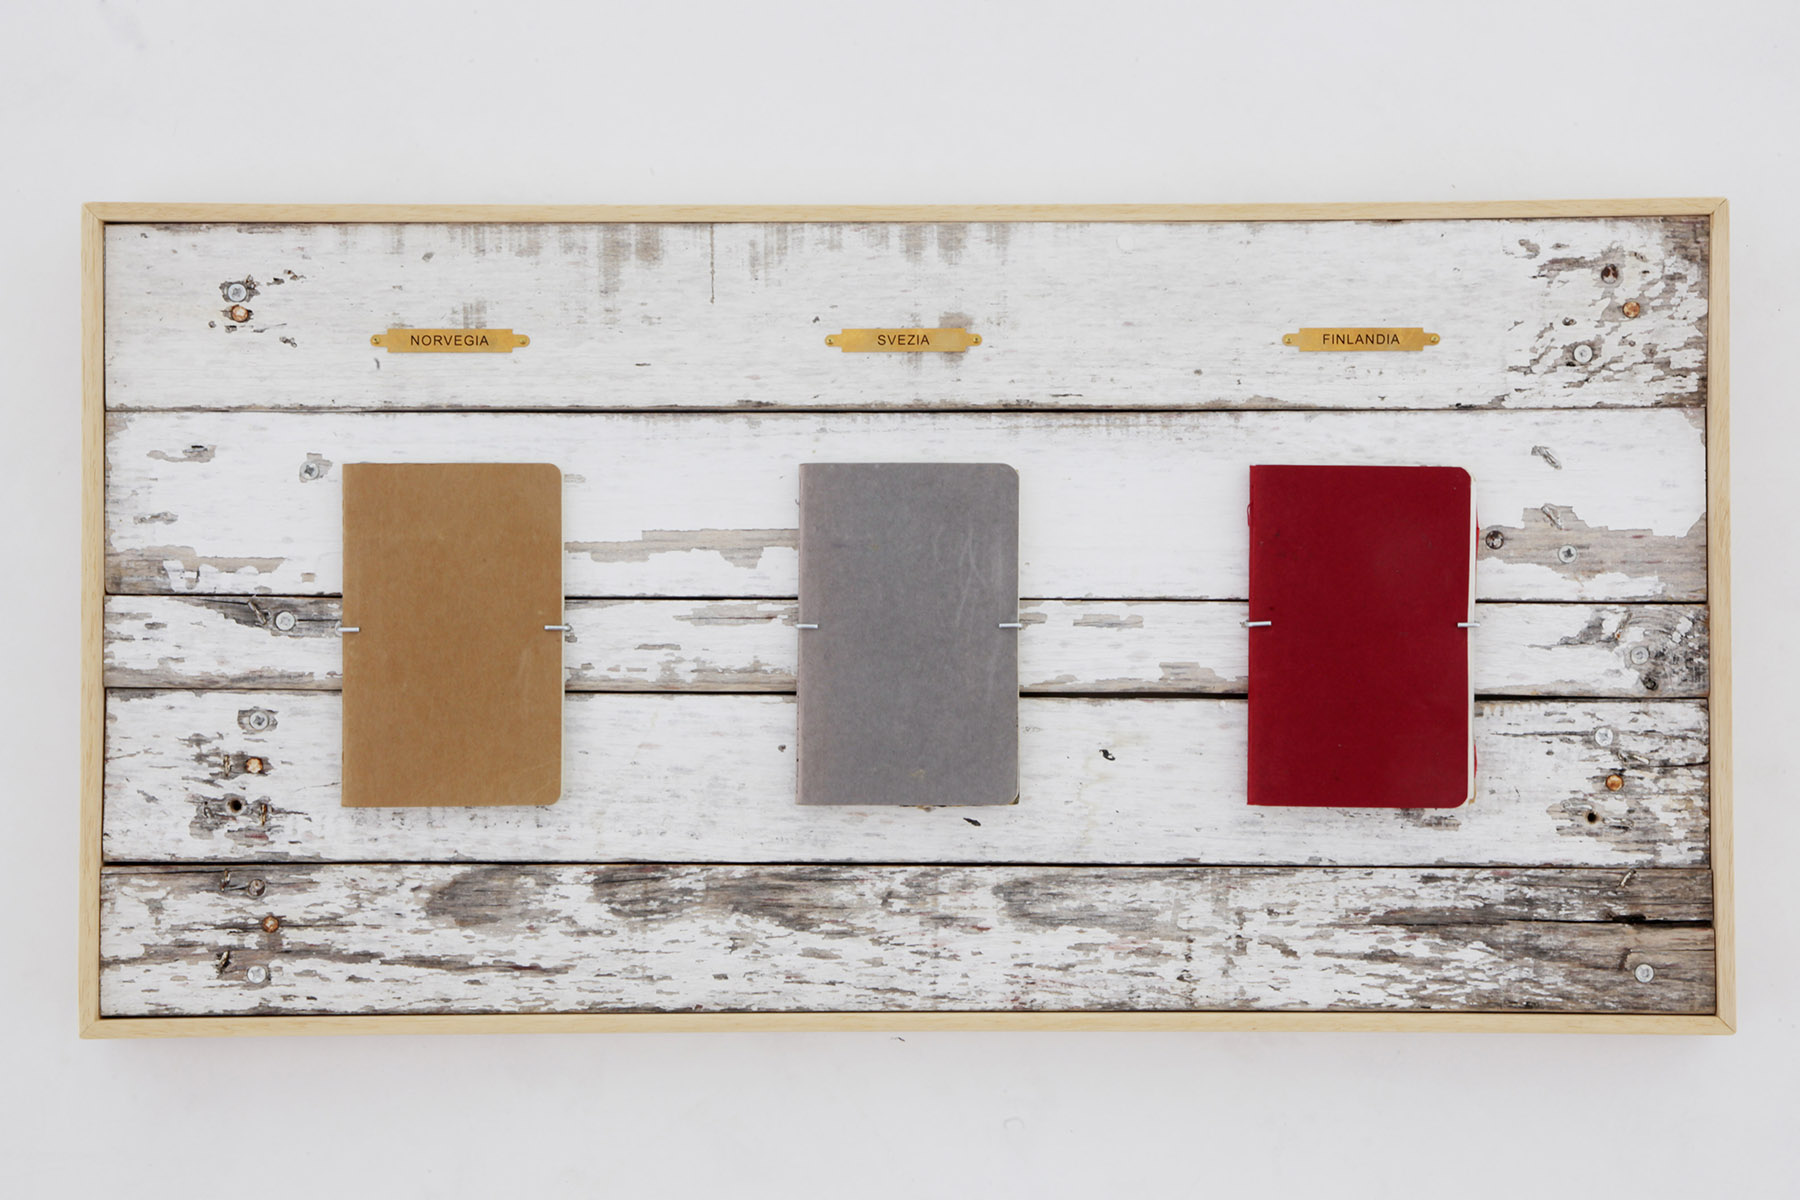 Daniele Girardi, 2021, North Way sketch books, Moleskine, opere arte